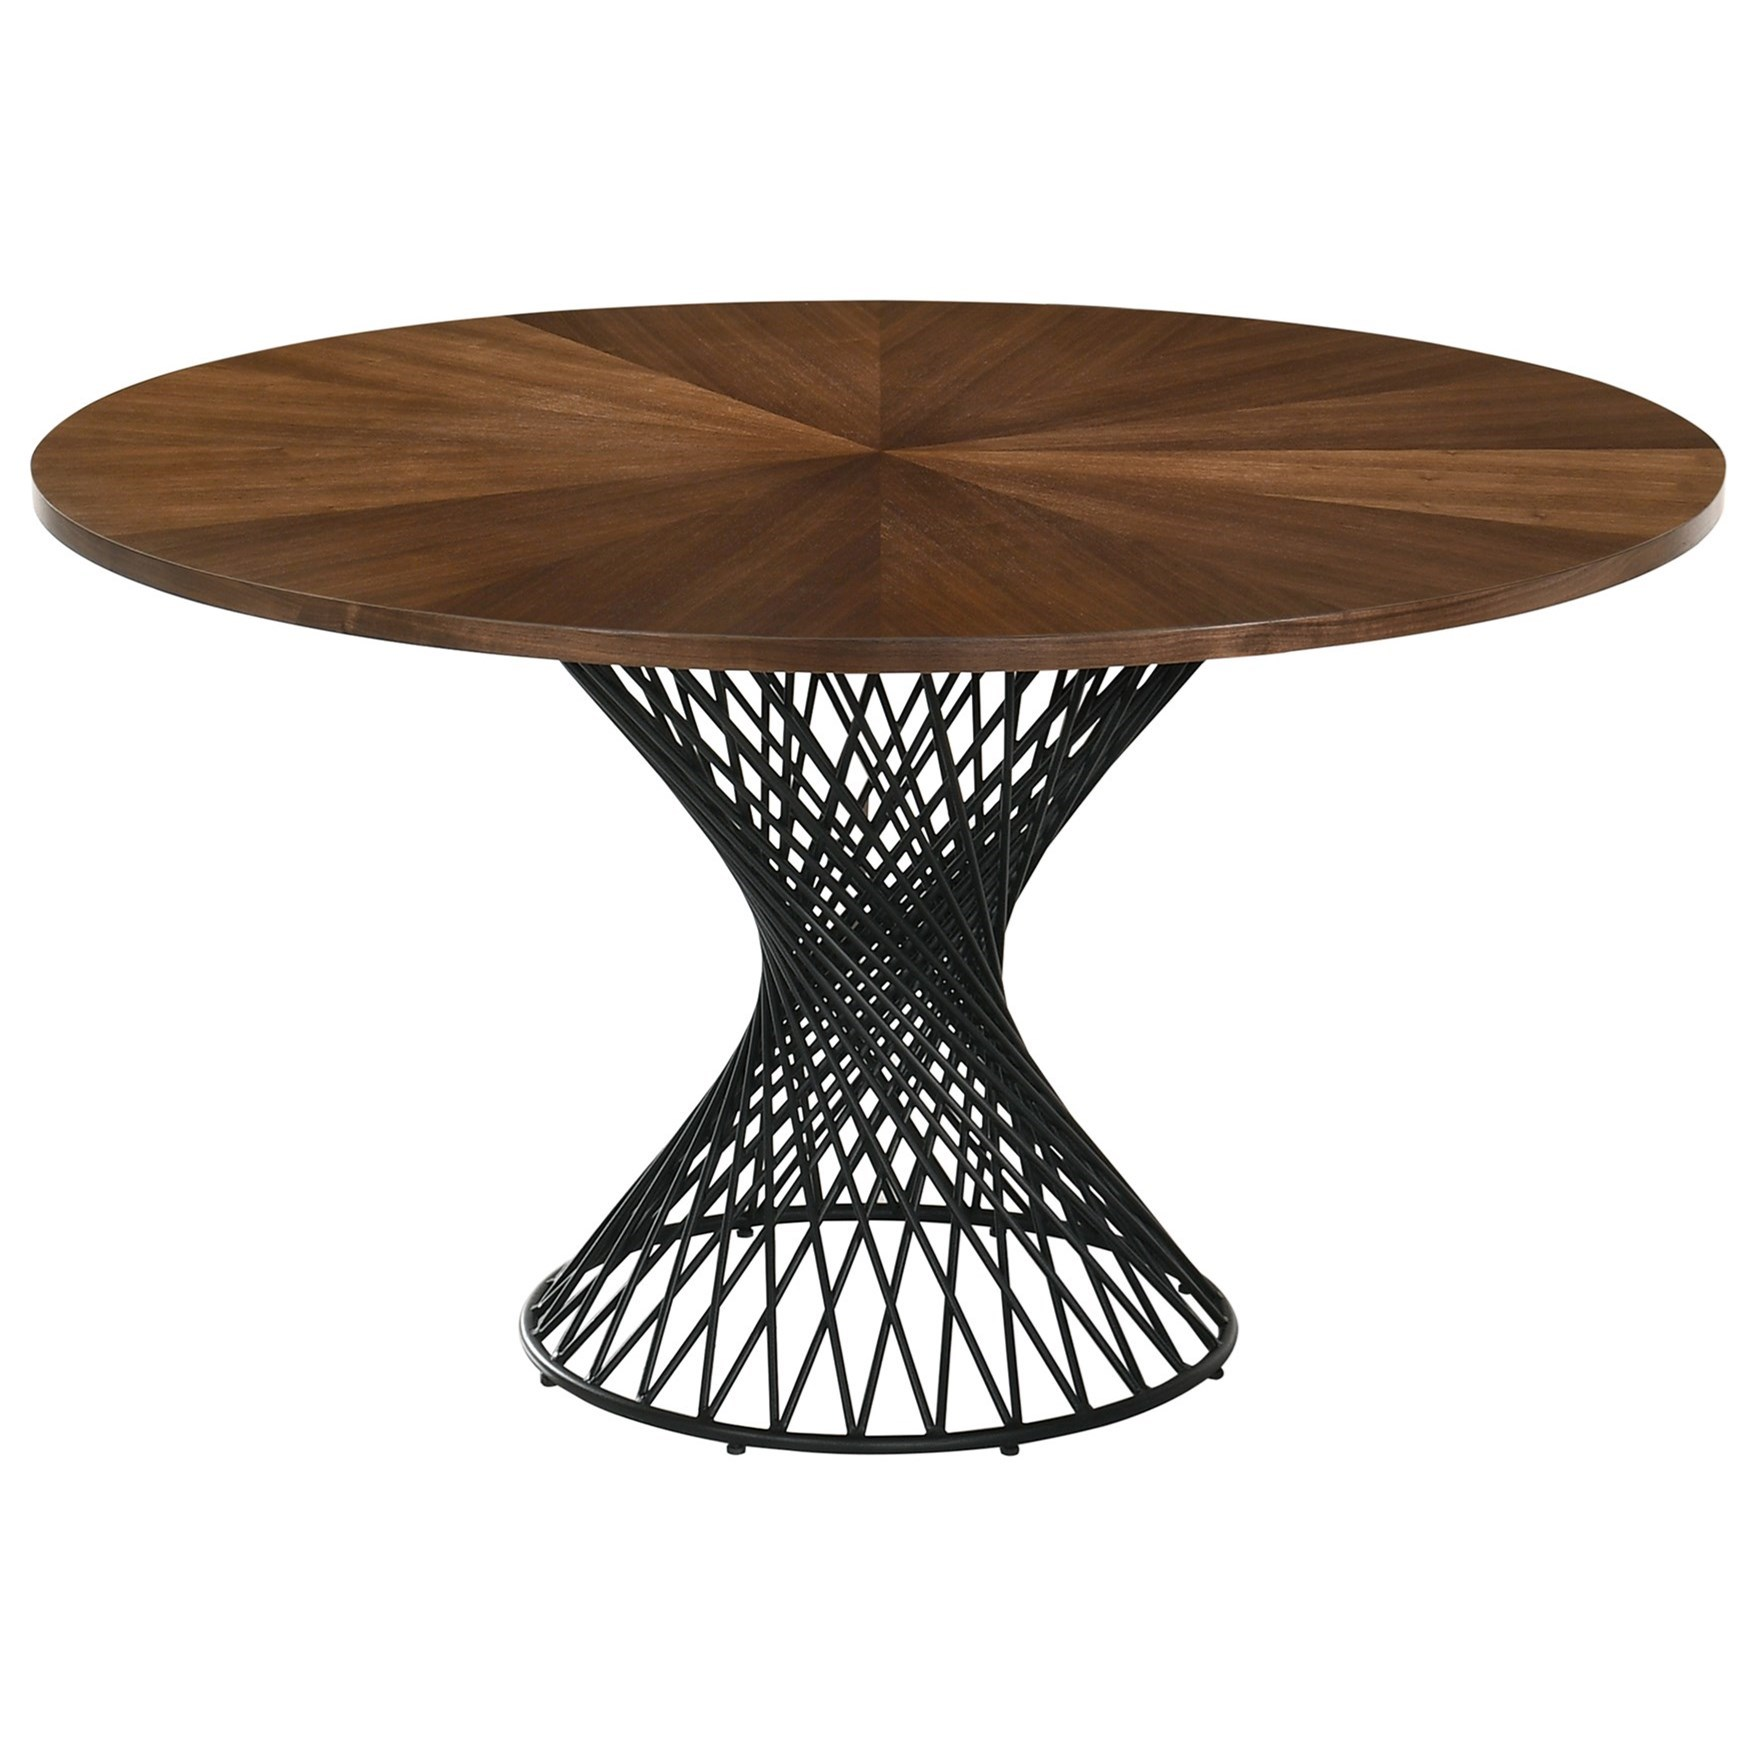 "Cirque 54"" Round Mid-Century Modern Pedestal Walnut at Sadler's Home Furnishings"